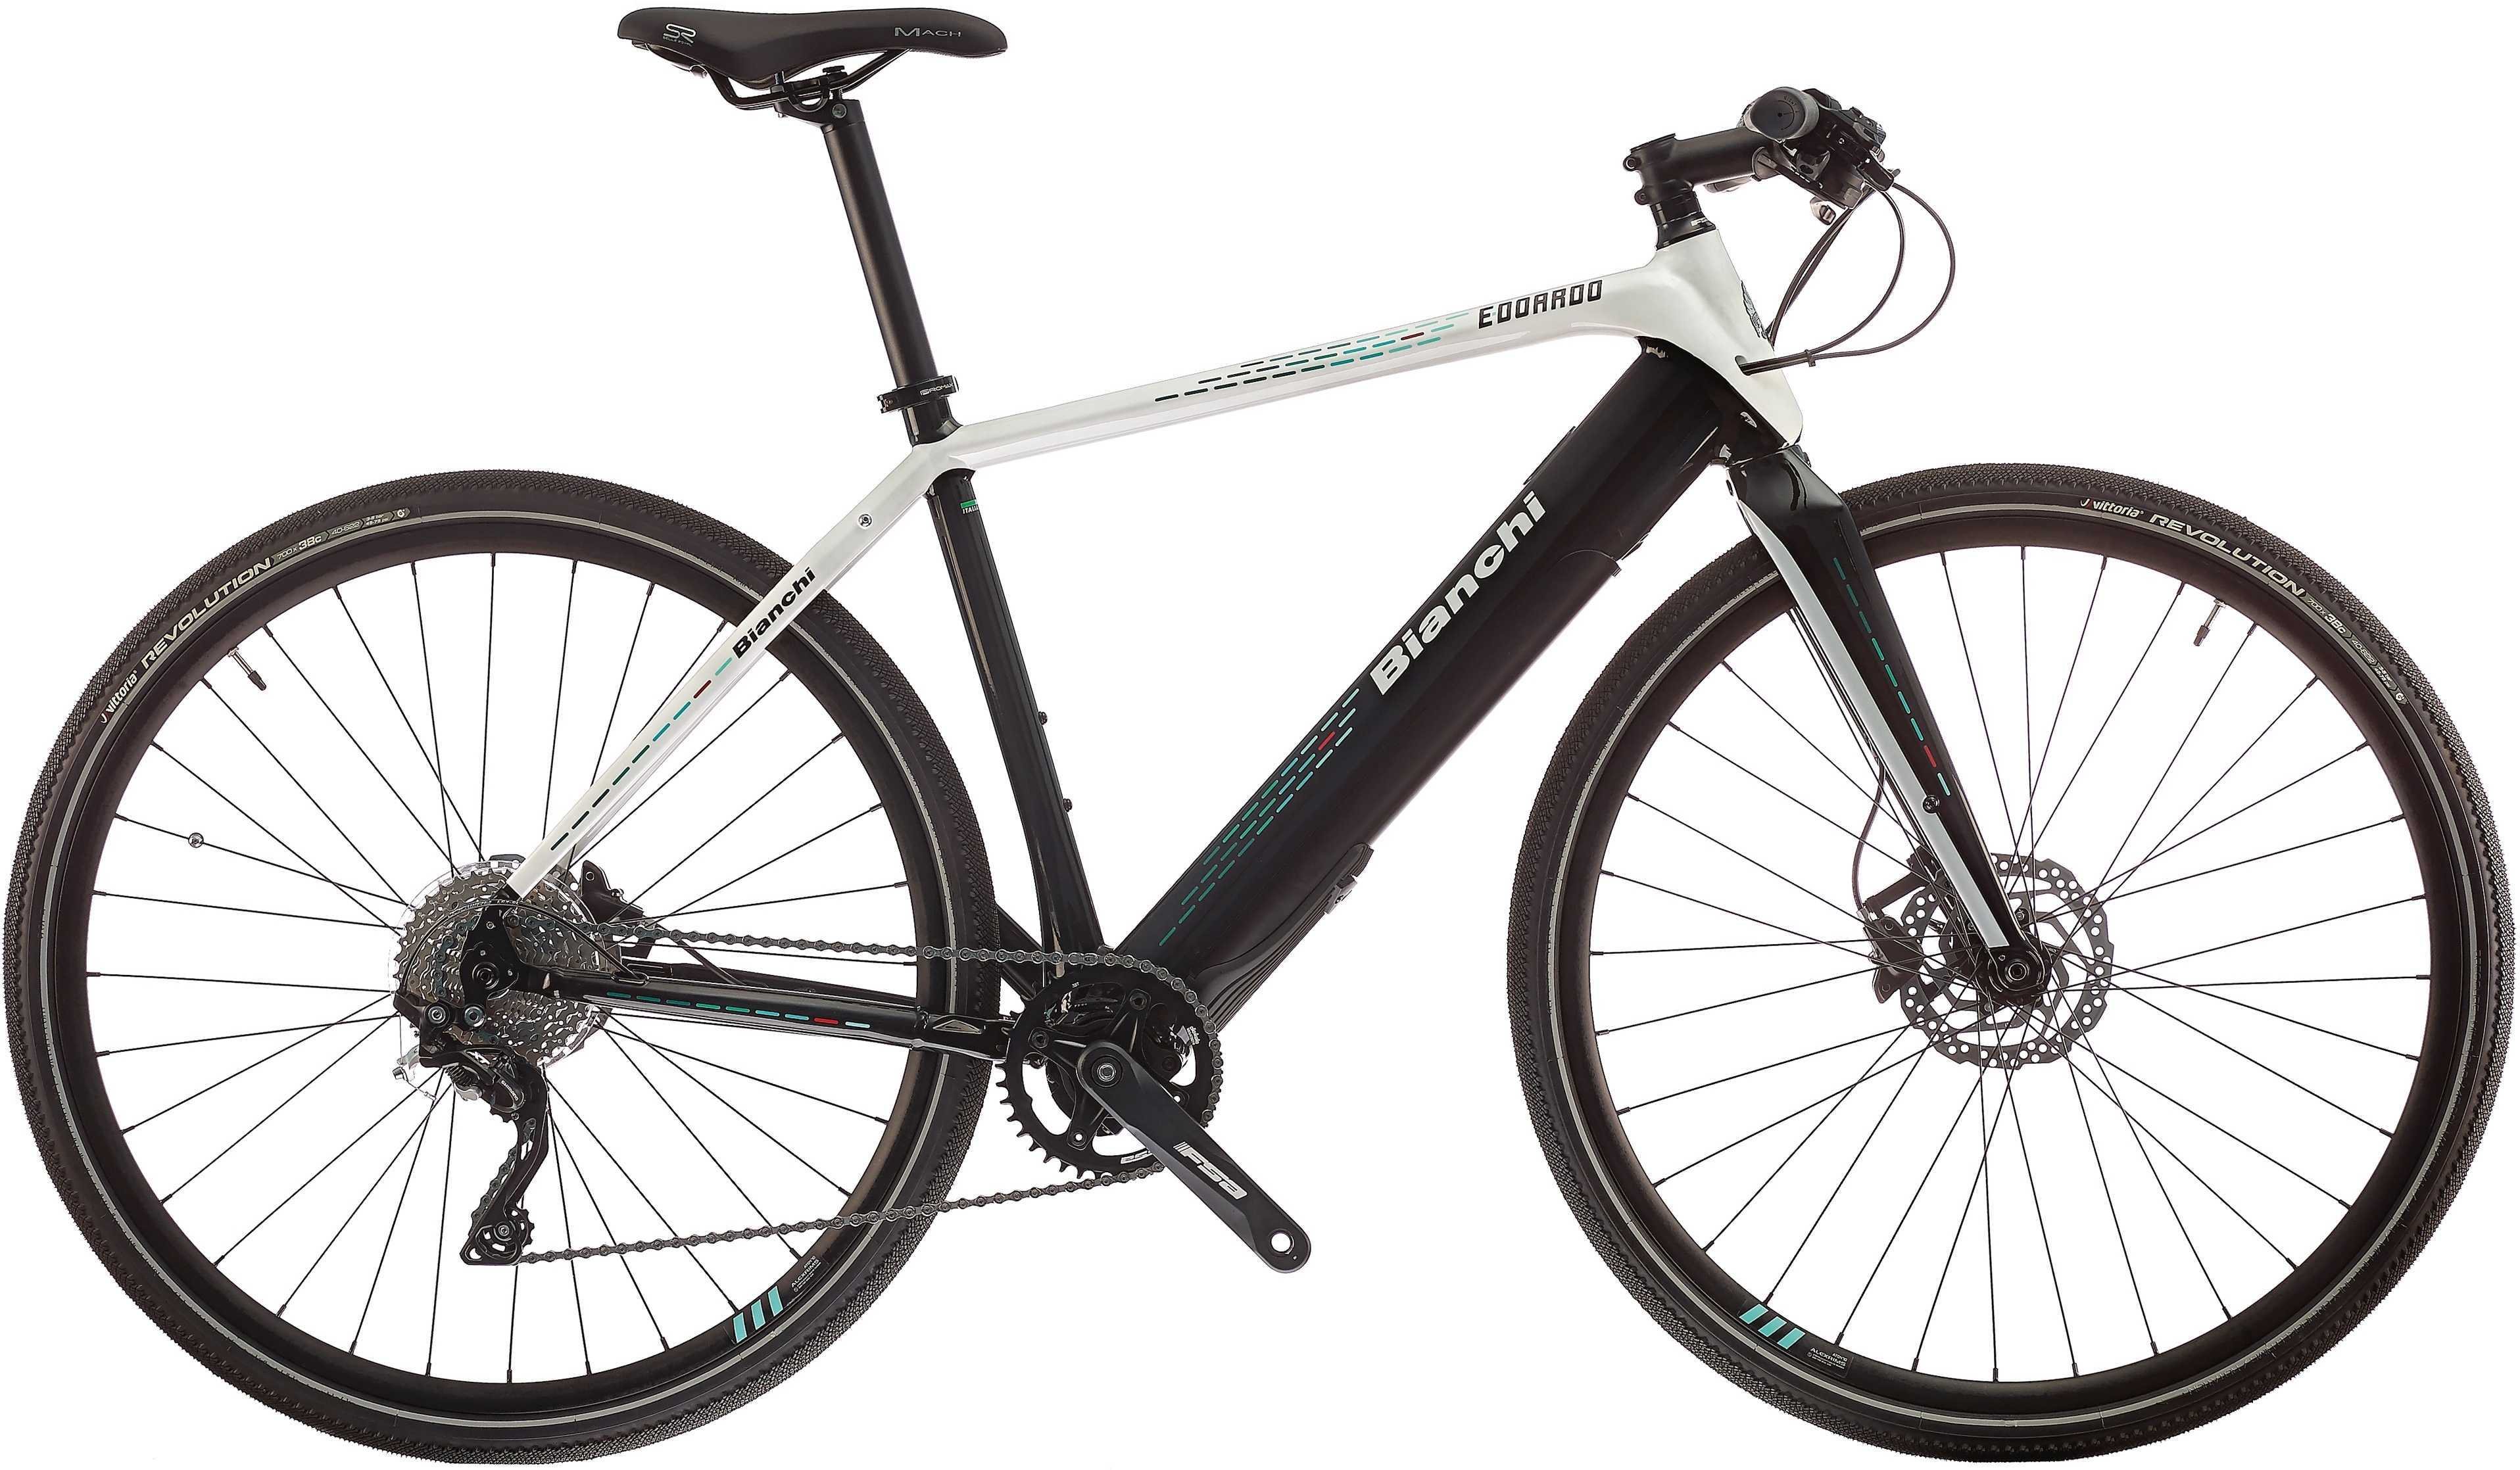 Bianchi Edoardo XT/Deore pärlvit/svart 50 cm